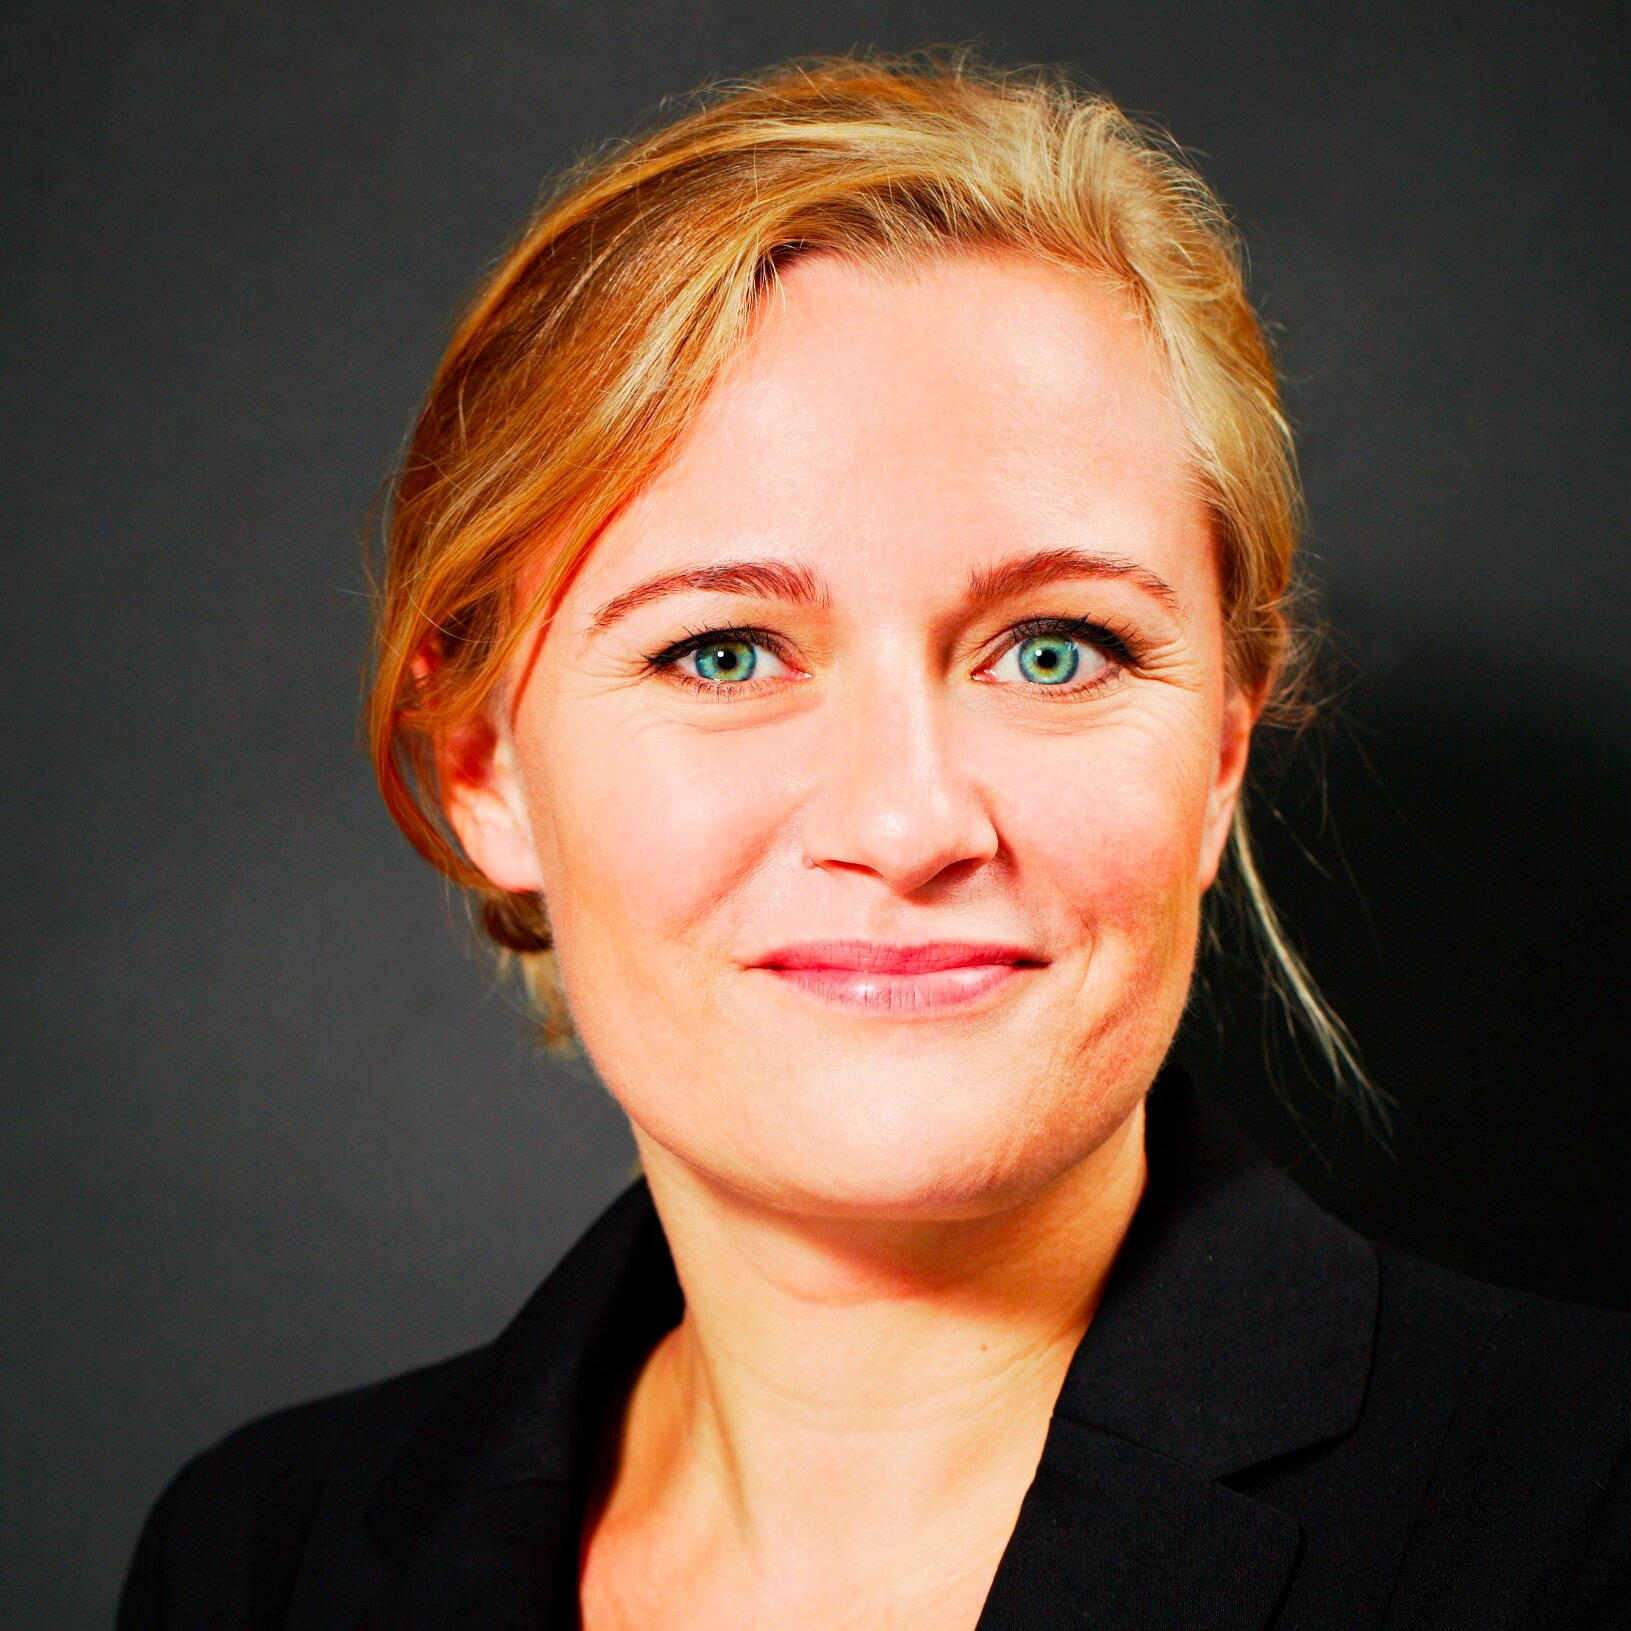 Pernille Hjortkjær